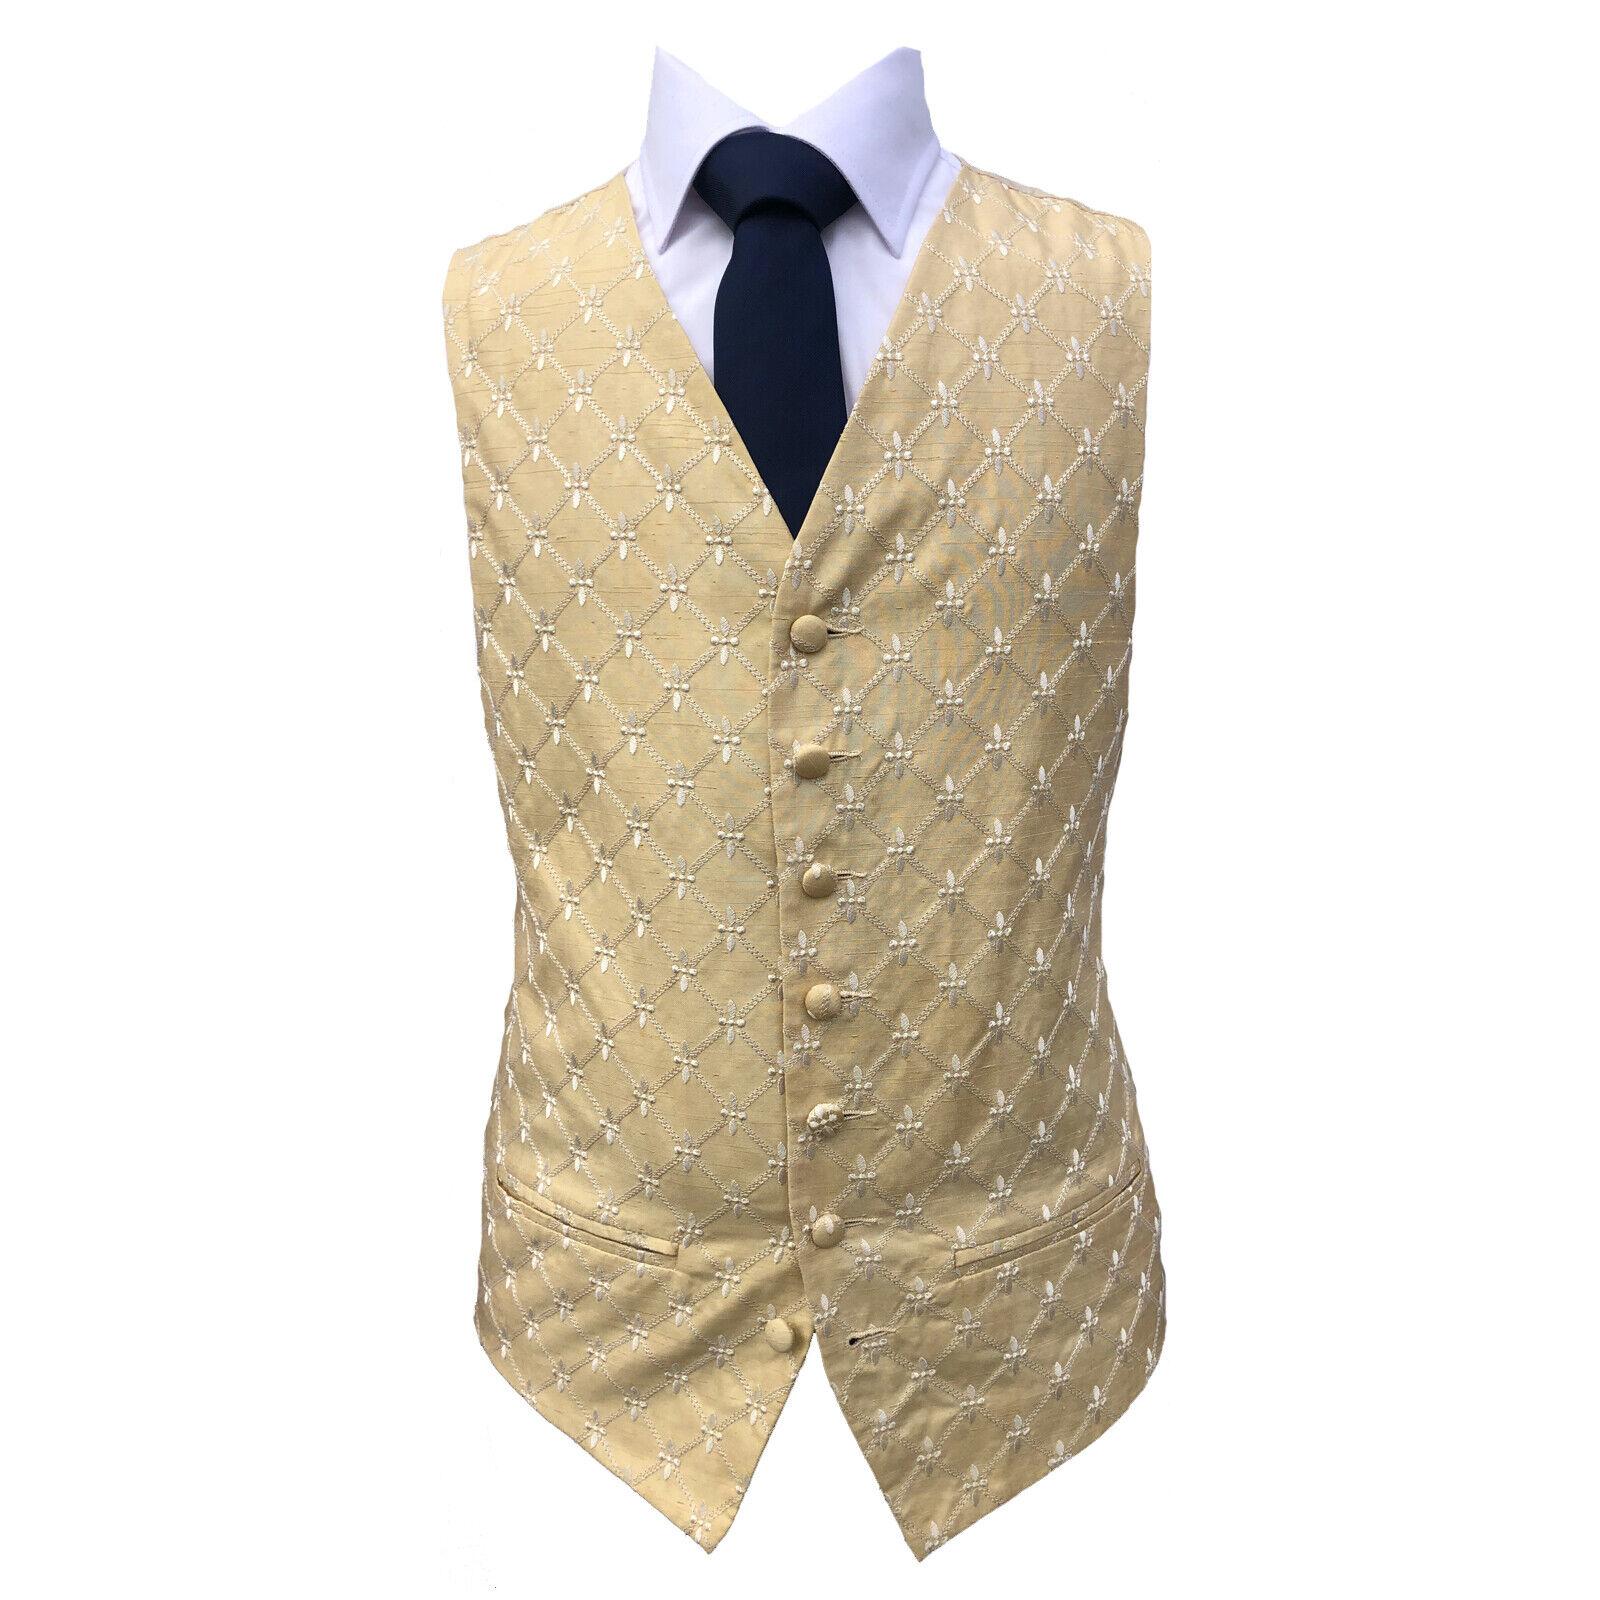 Gold Champagne Diamond Wedding Waistcoat UK Mens And Page Boy Sizes (A23)